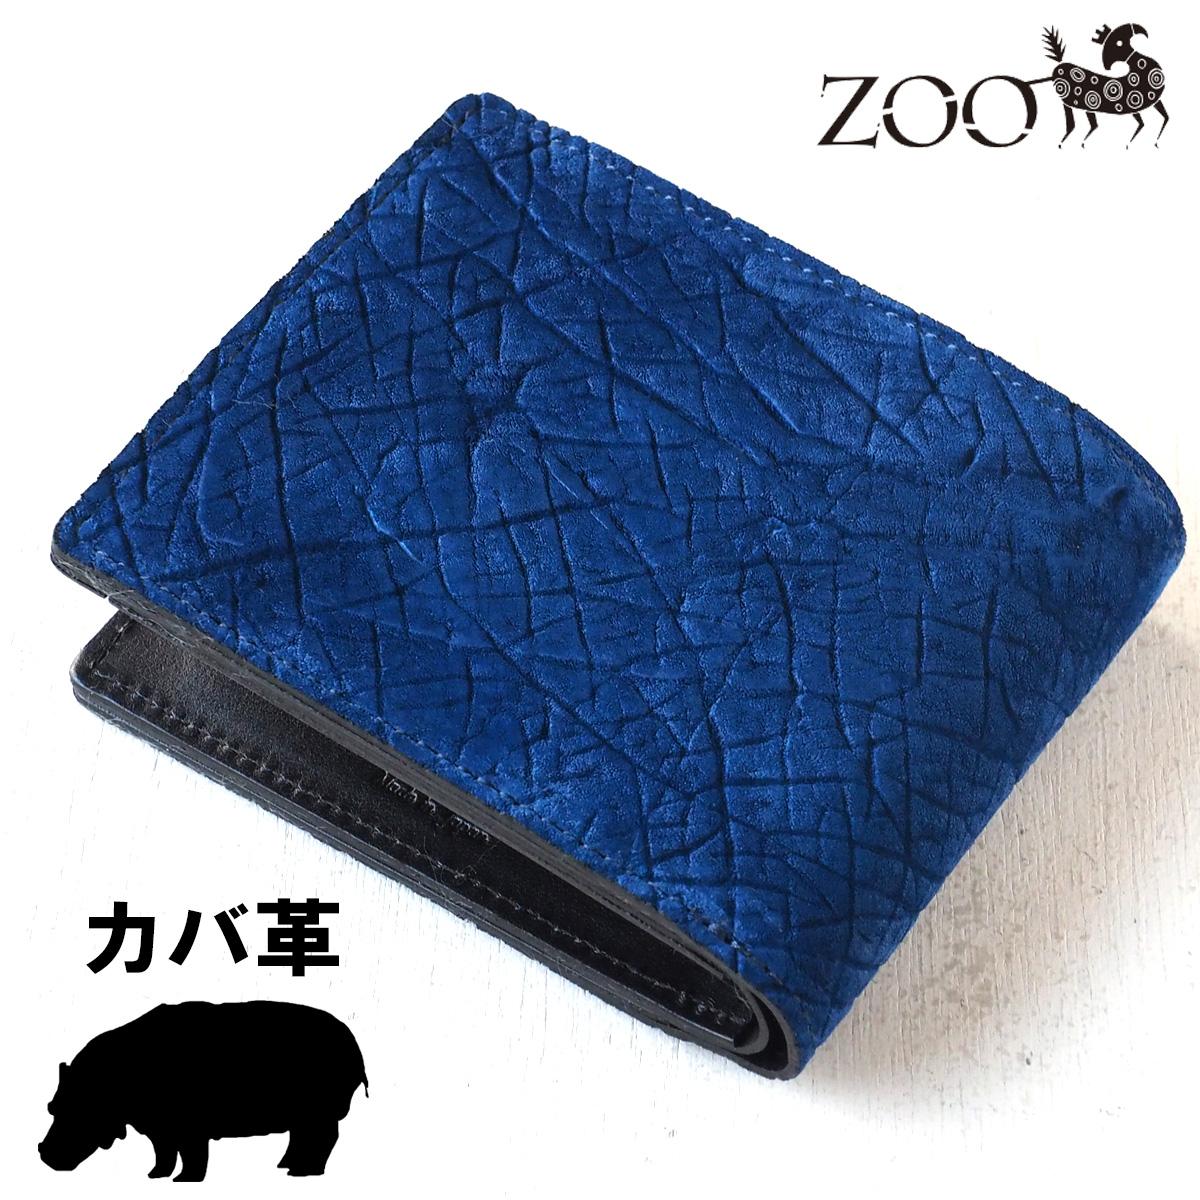 ZOO(ズー) カバ革 バジャービルフォールド18 コンパクト 二つ折り財布 ブルー